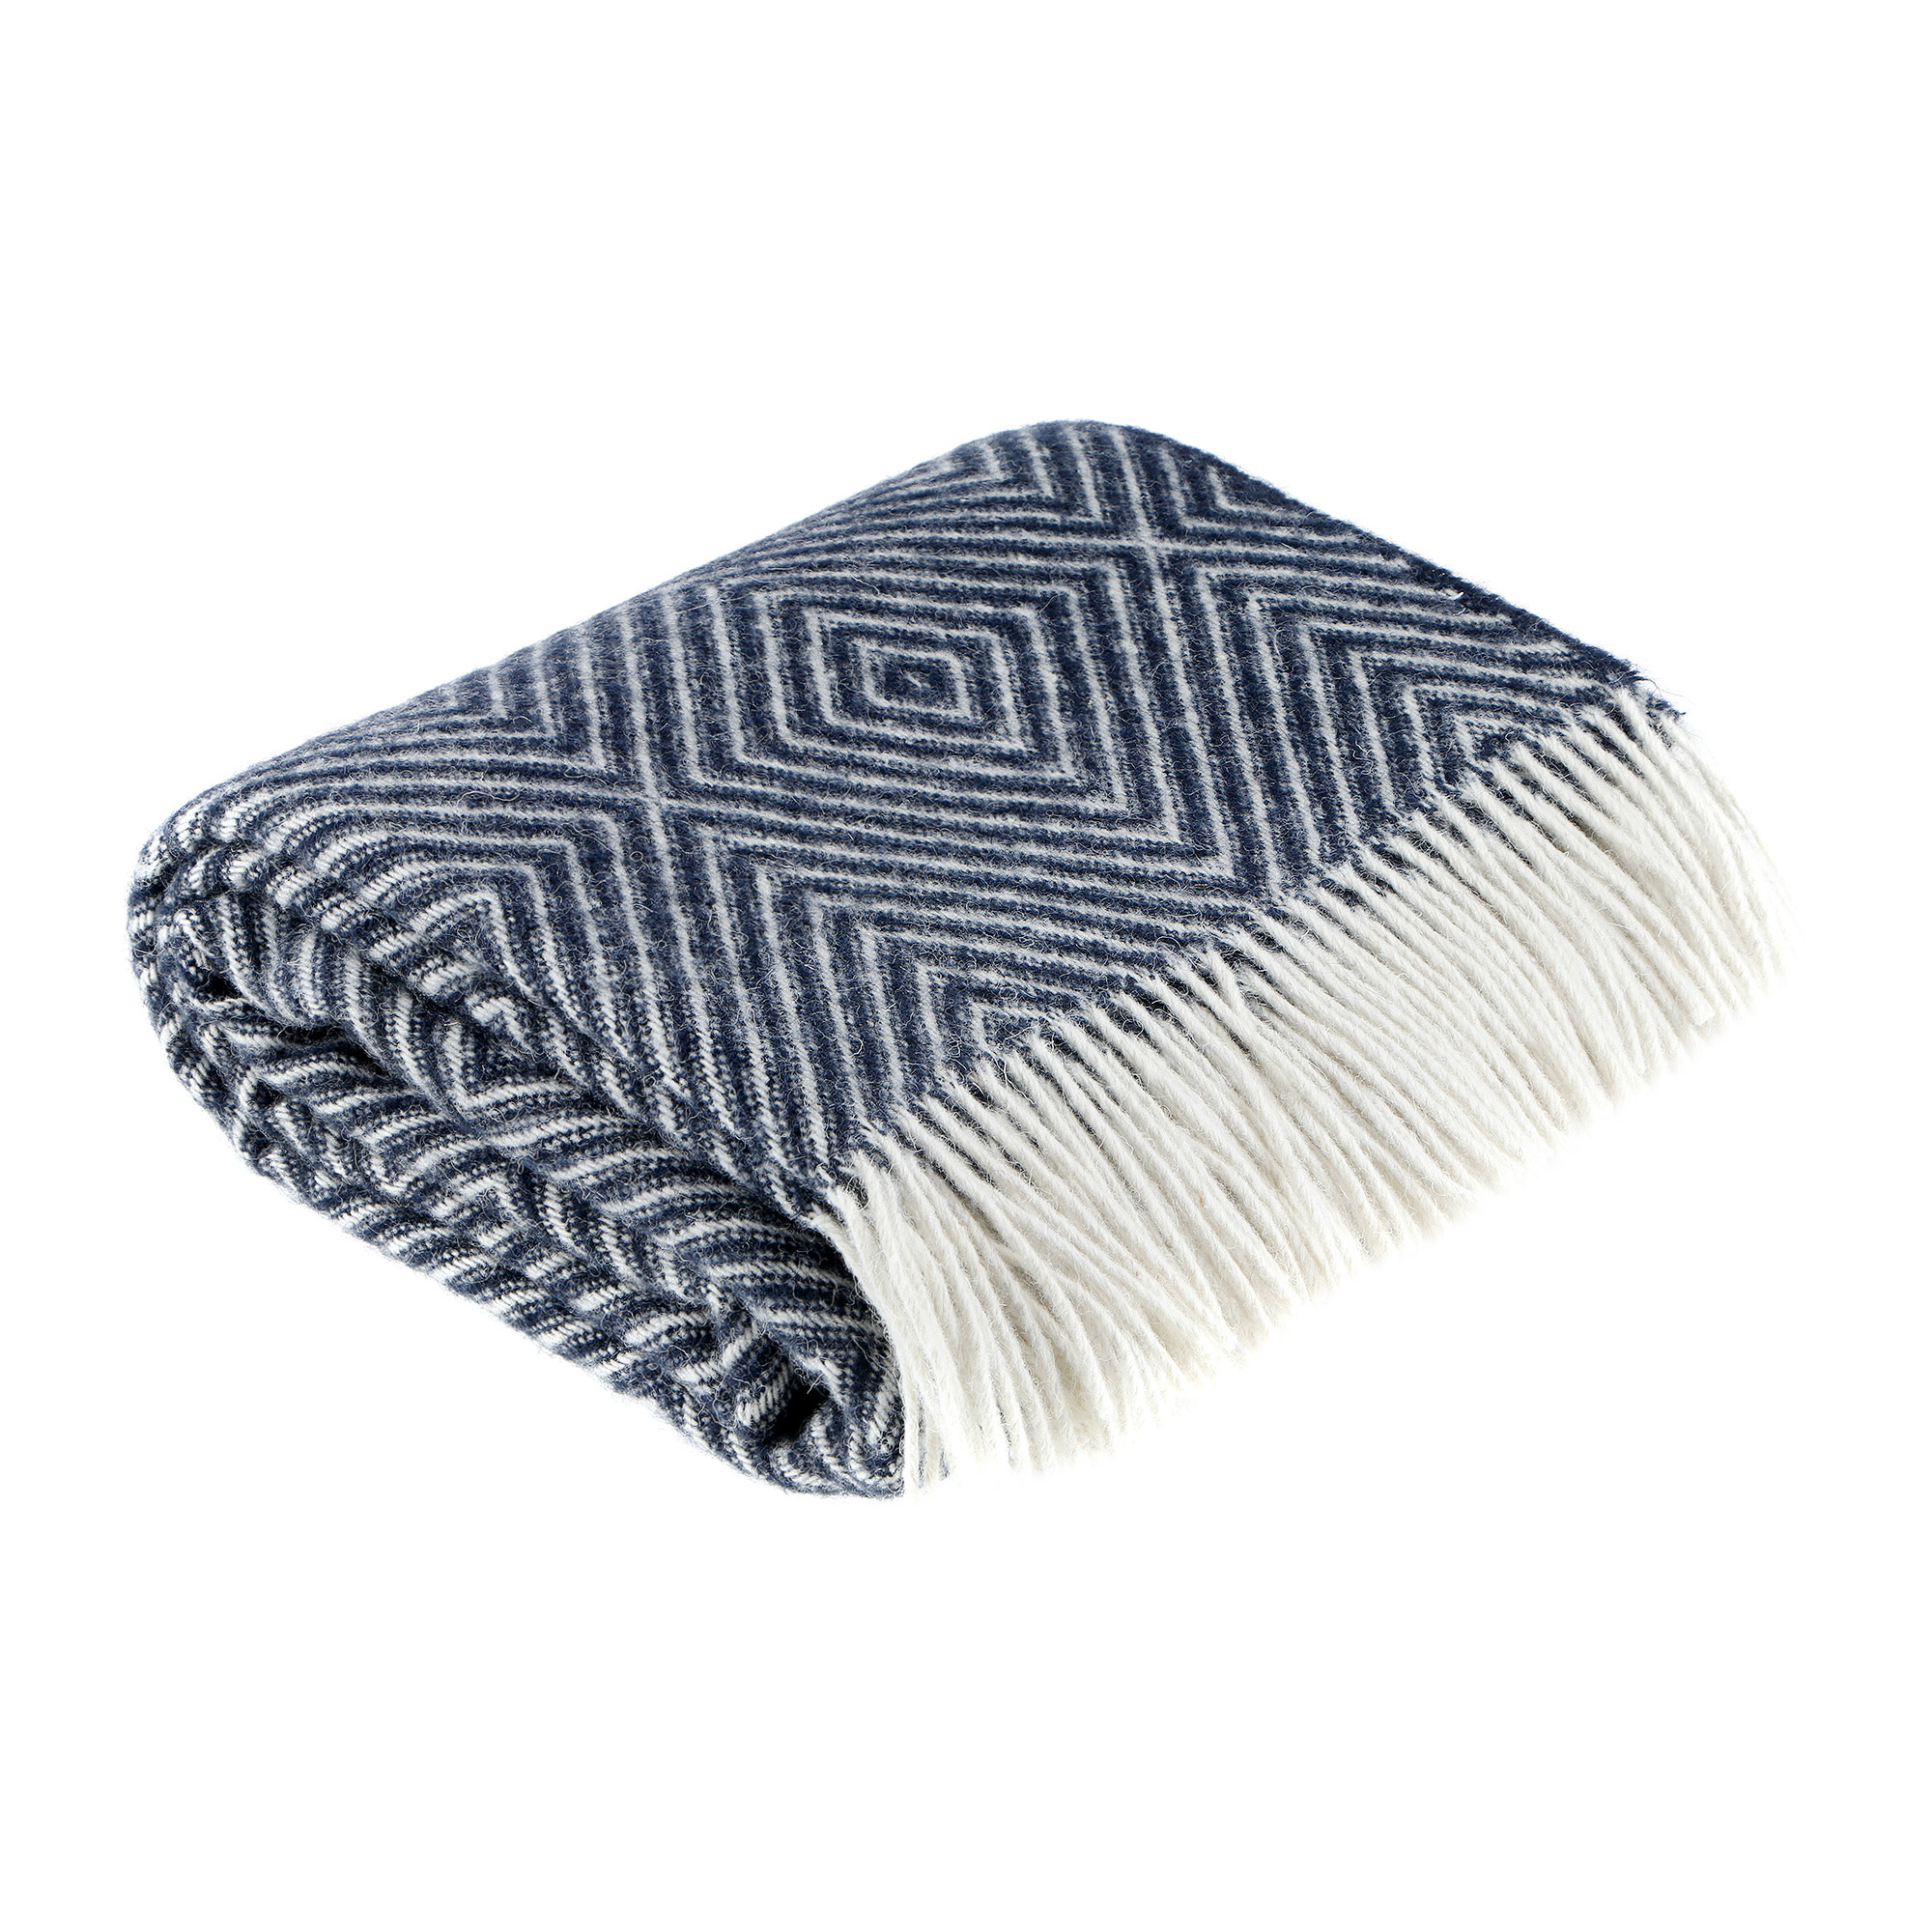 Плед Home blanket astrid 130х190 бело-темно синий